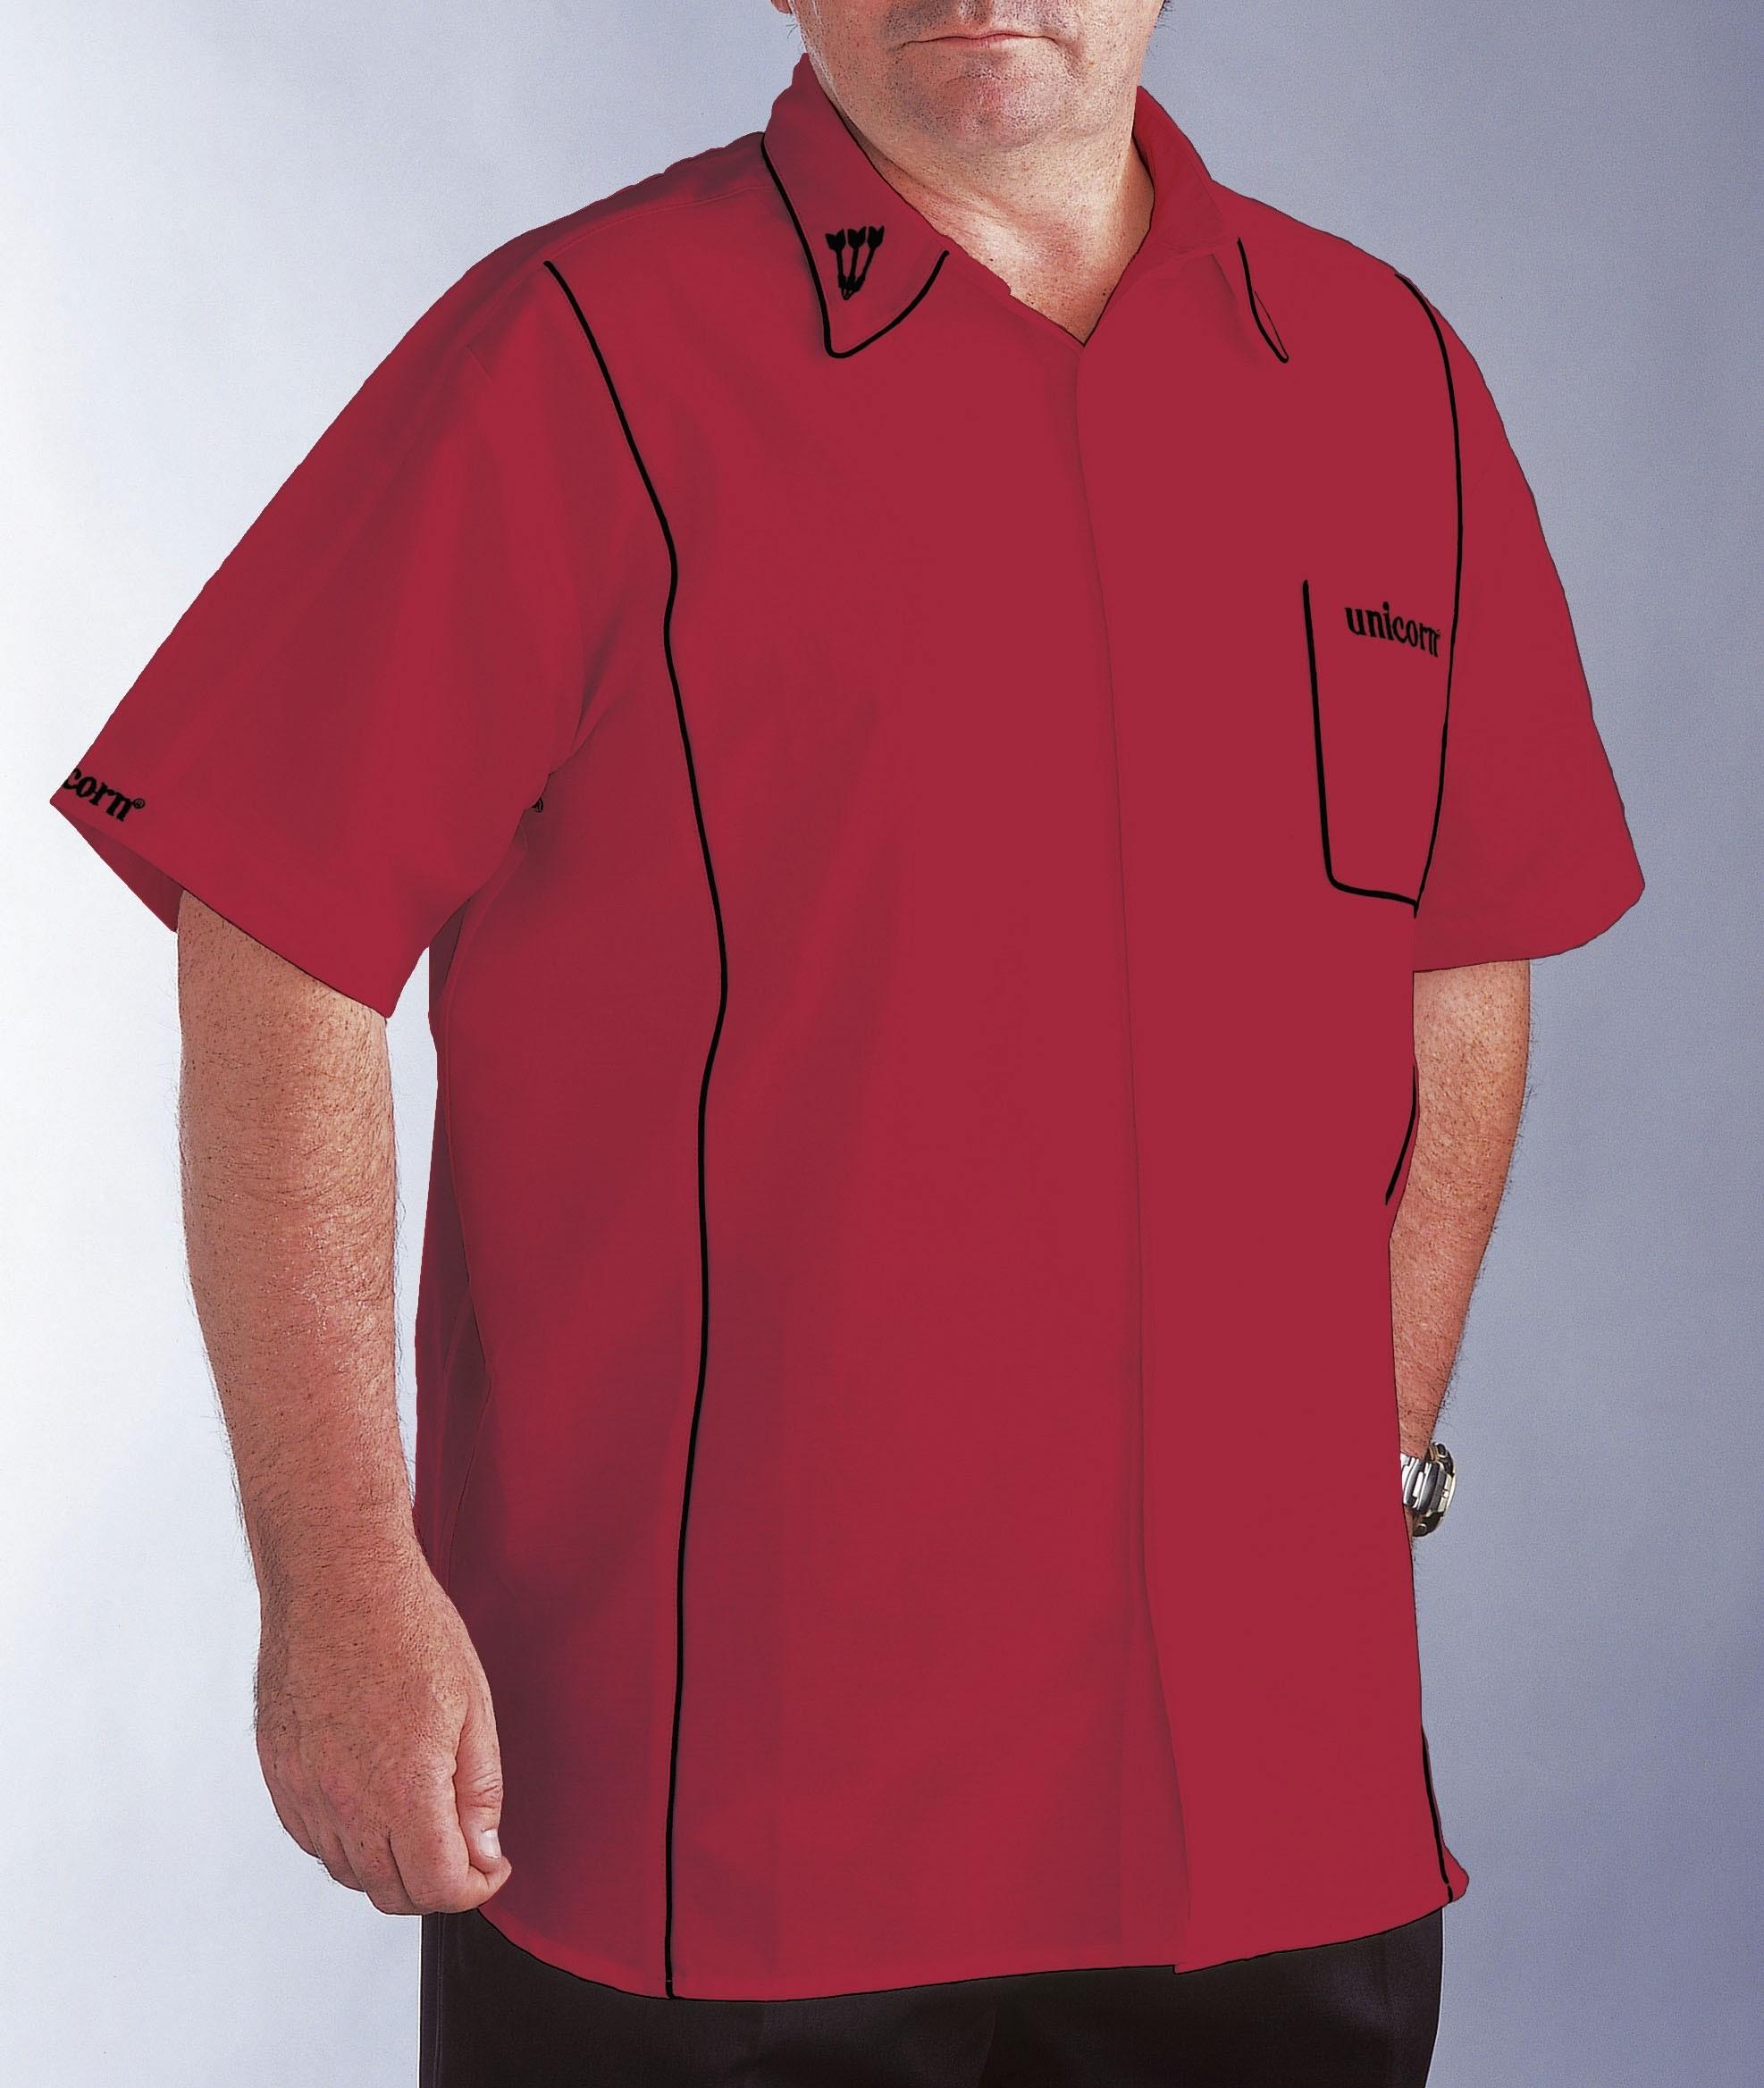 Teknik Dart Shirt Mens Red/Black - SAVE £24!